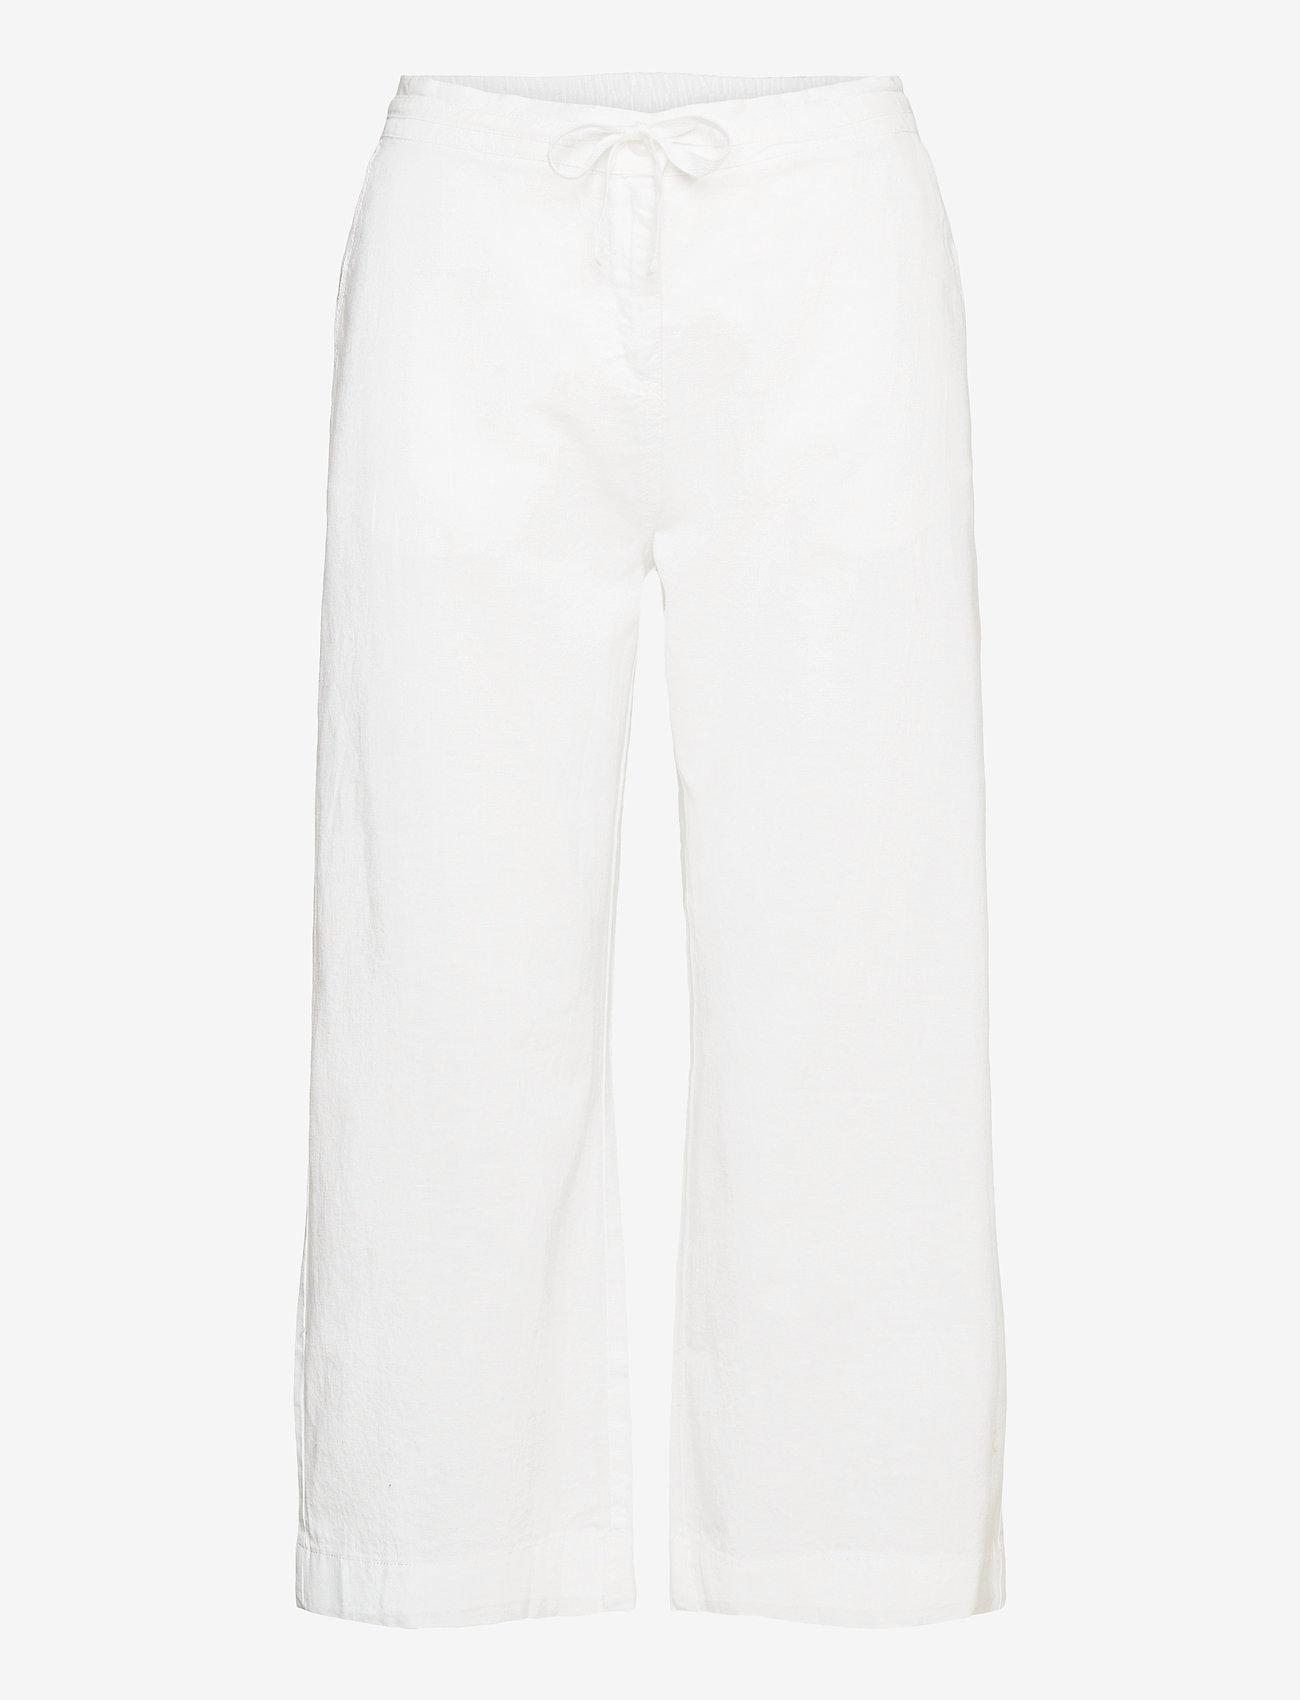 Brandtex - Capri pants - bukser med brede ben - white - 1